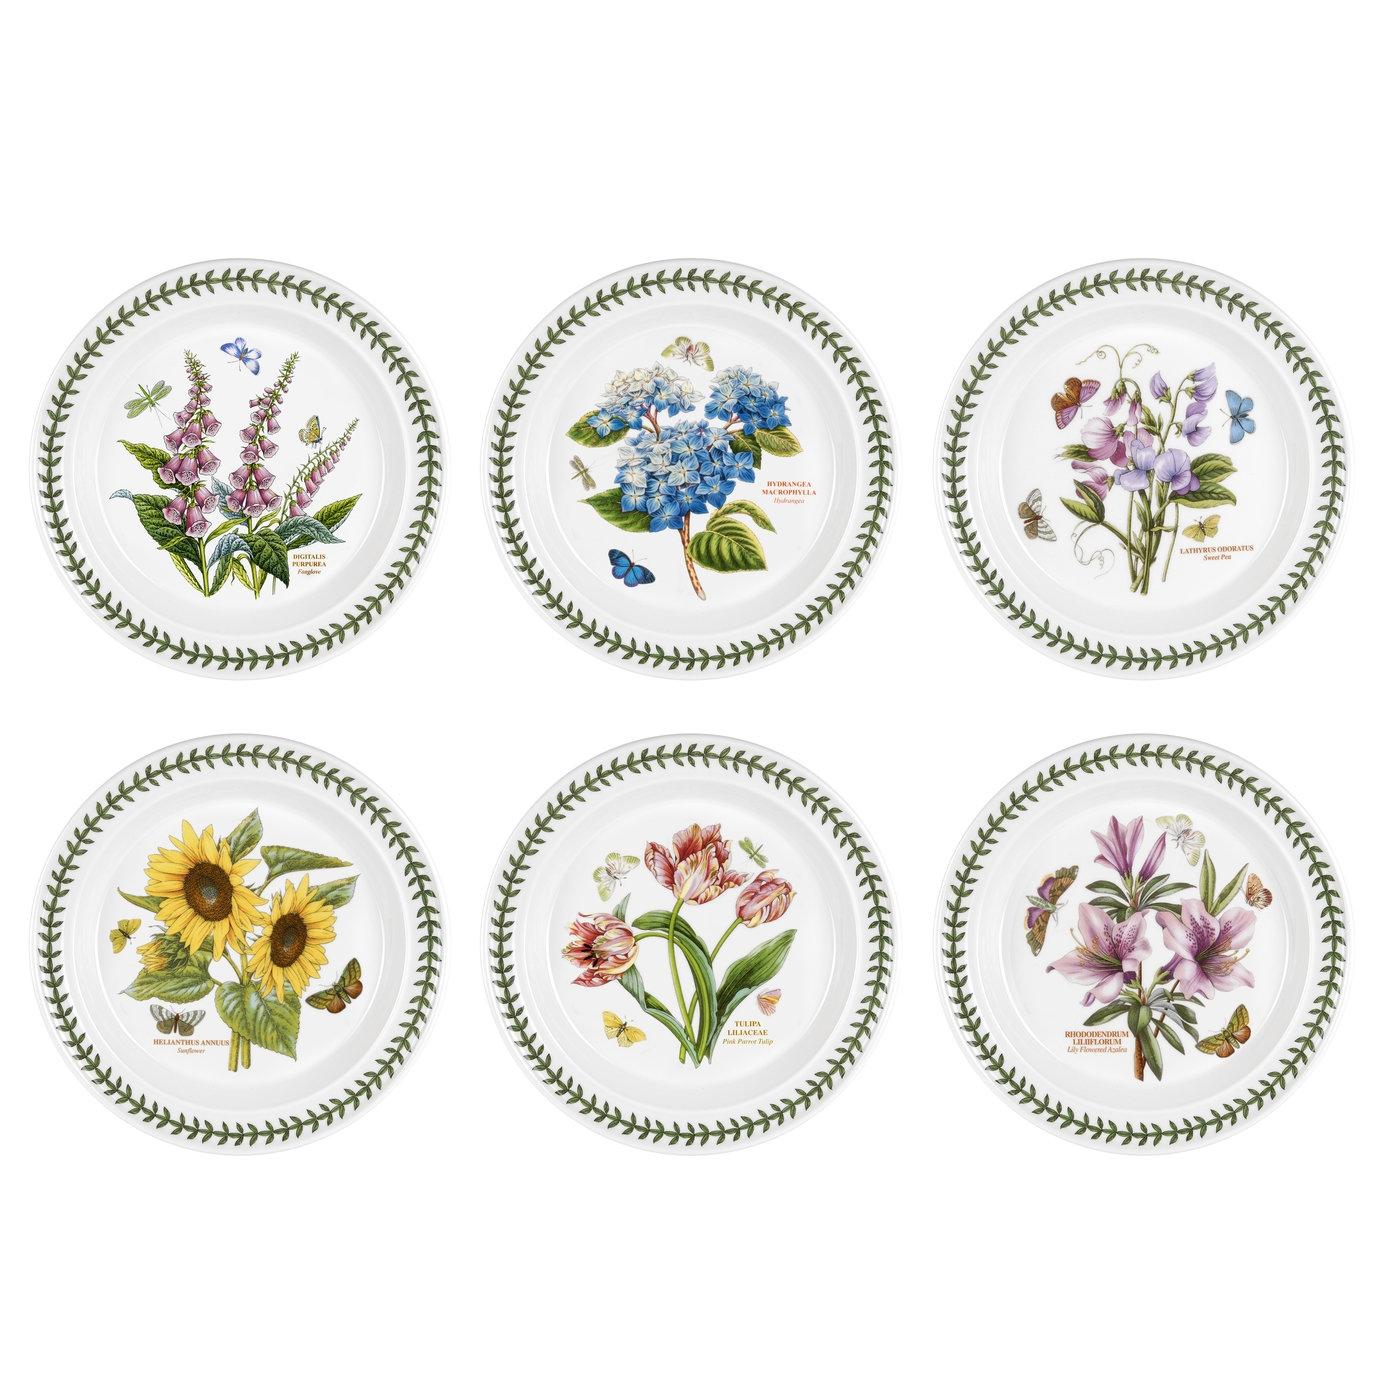 Portmeirion Botanic Garden Set of 9 Dinner Plates Assorted Motifs